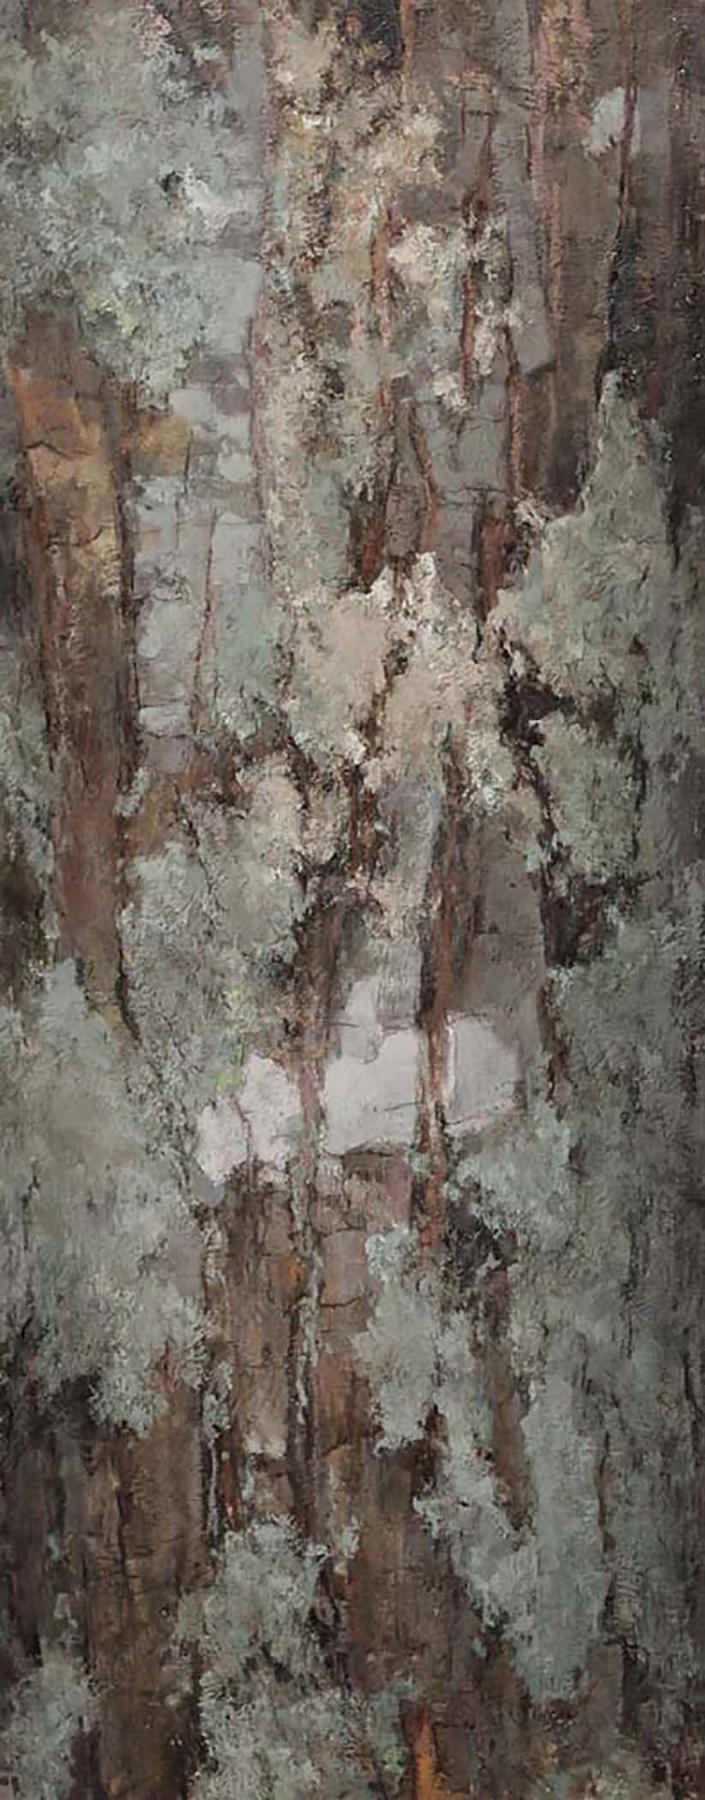 Bark - Red Oak